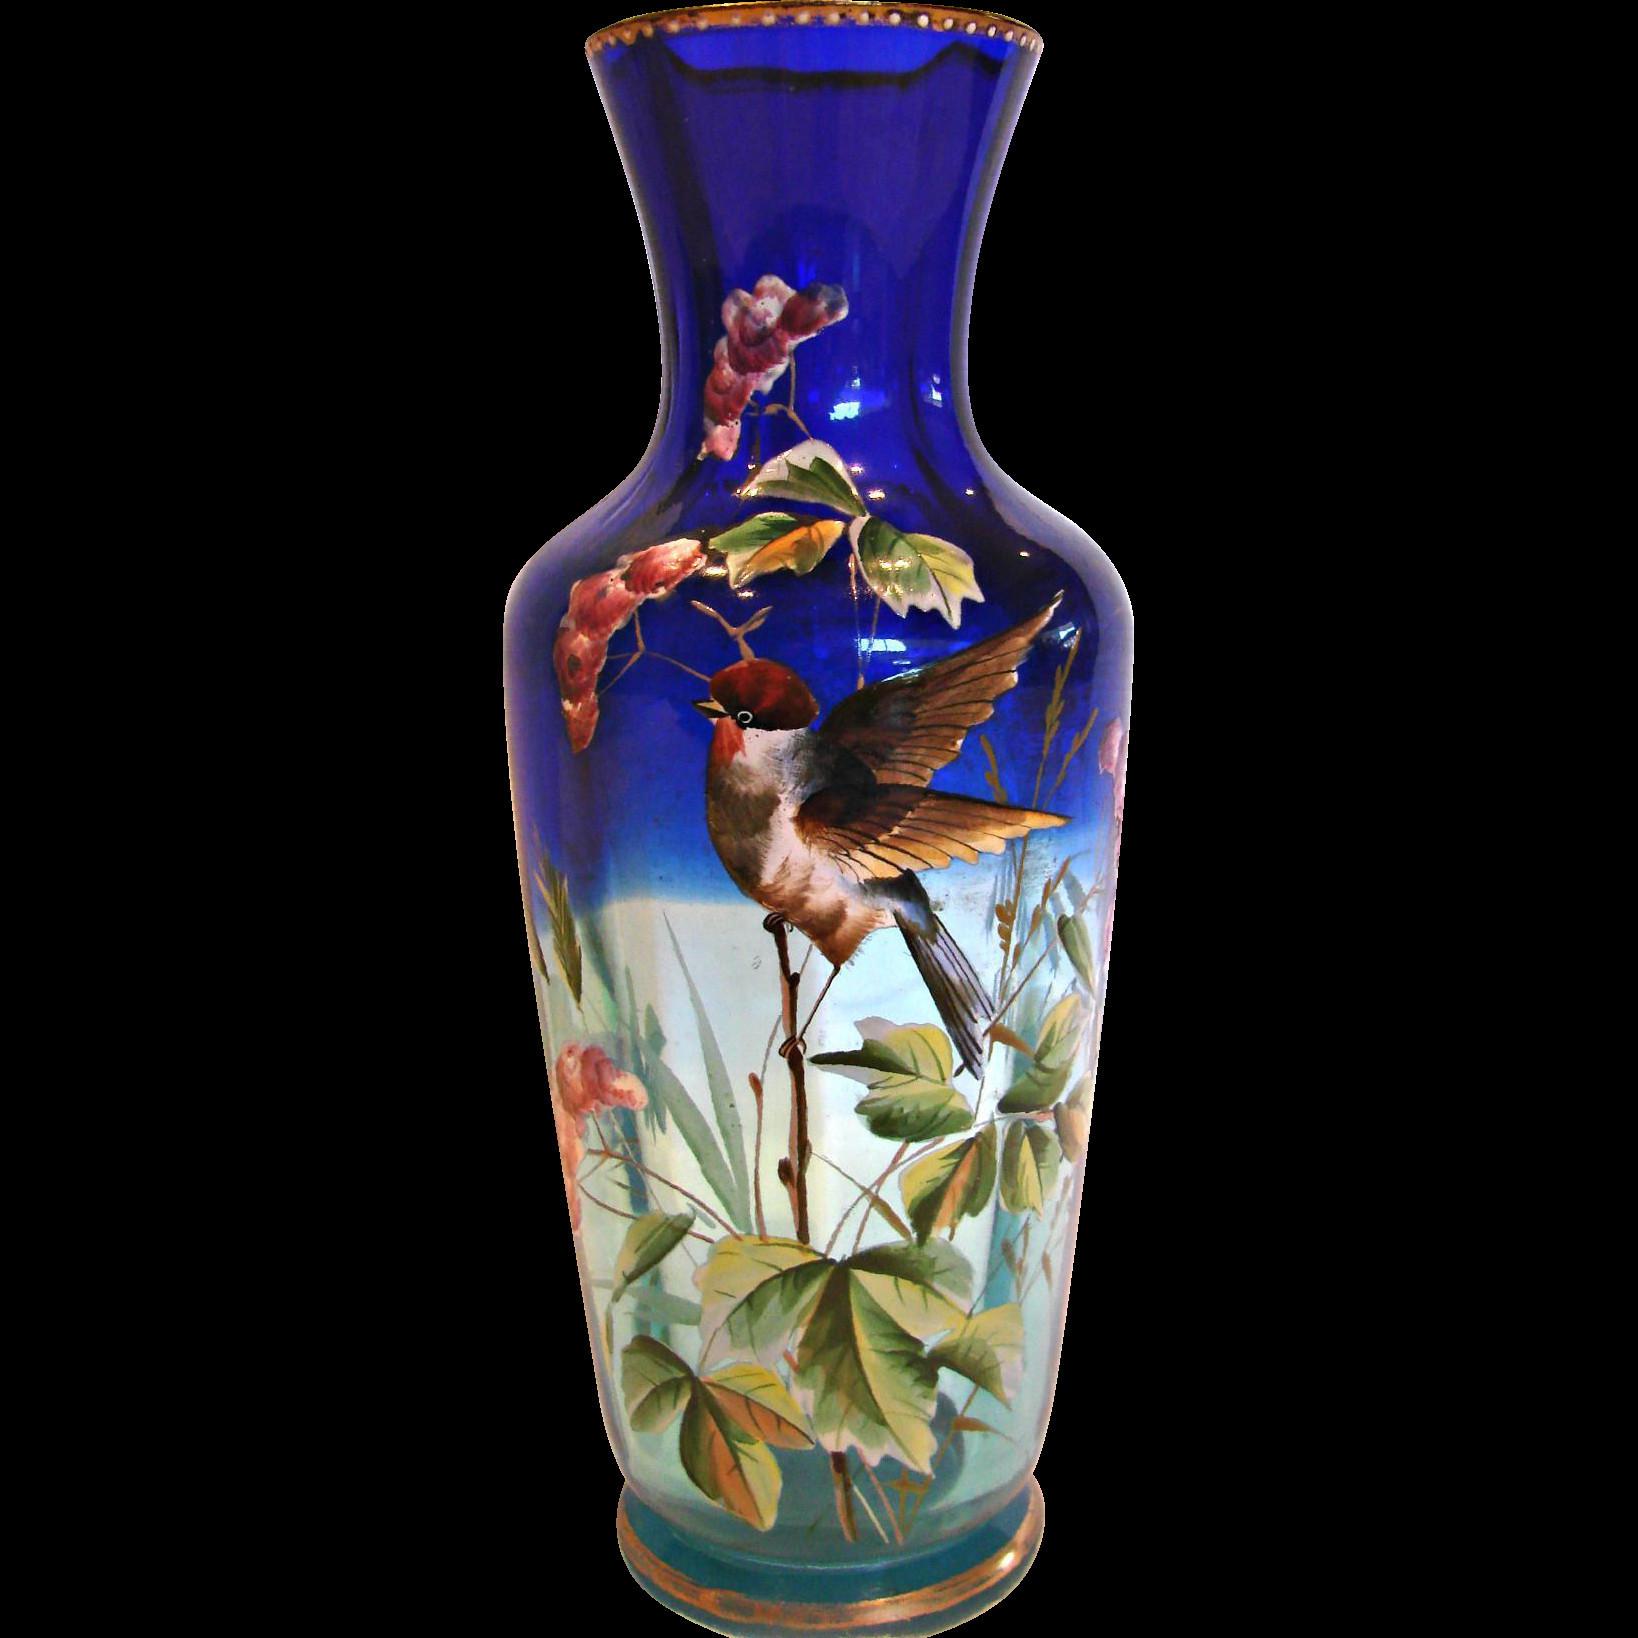 fenton glass small vase of 20 inspirational antique decorative glass vases inside bohemian shaded blue clear art glass vase enameled bird c 1880